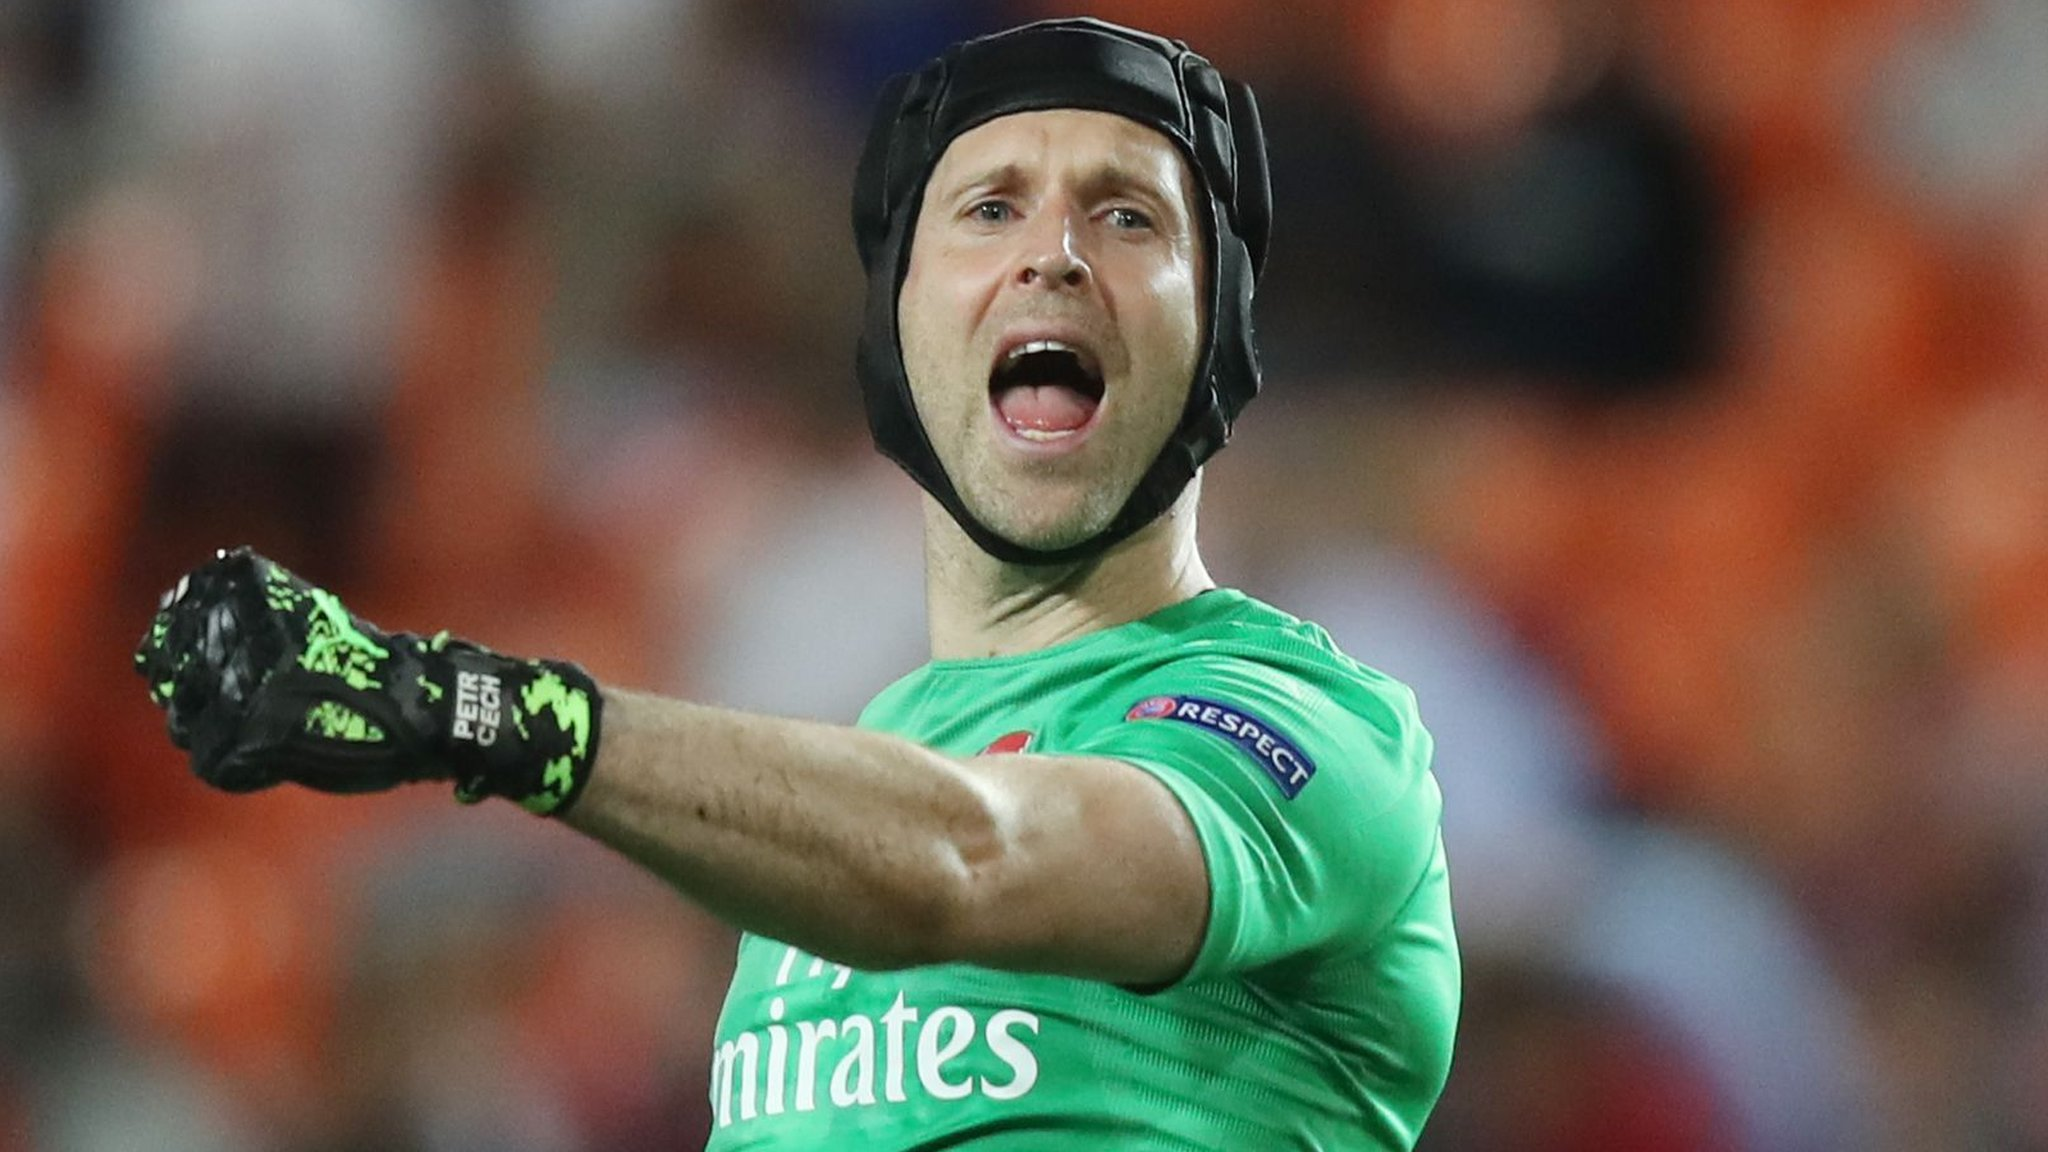 Football gossip: Cech, De Gea, Pogba, Zaha, Gomes